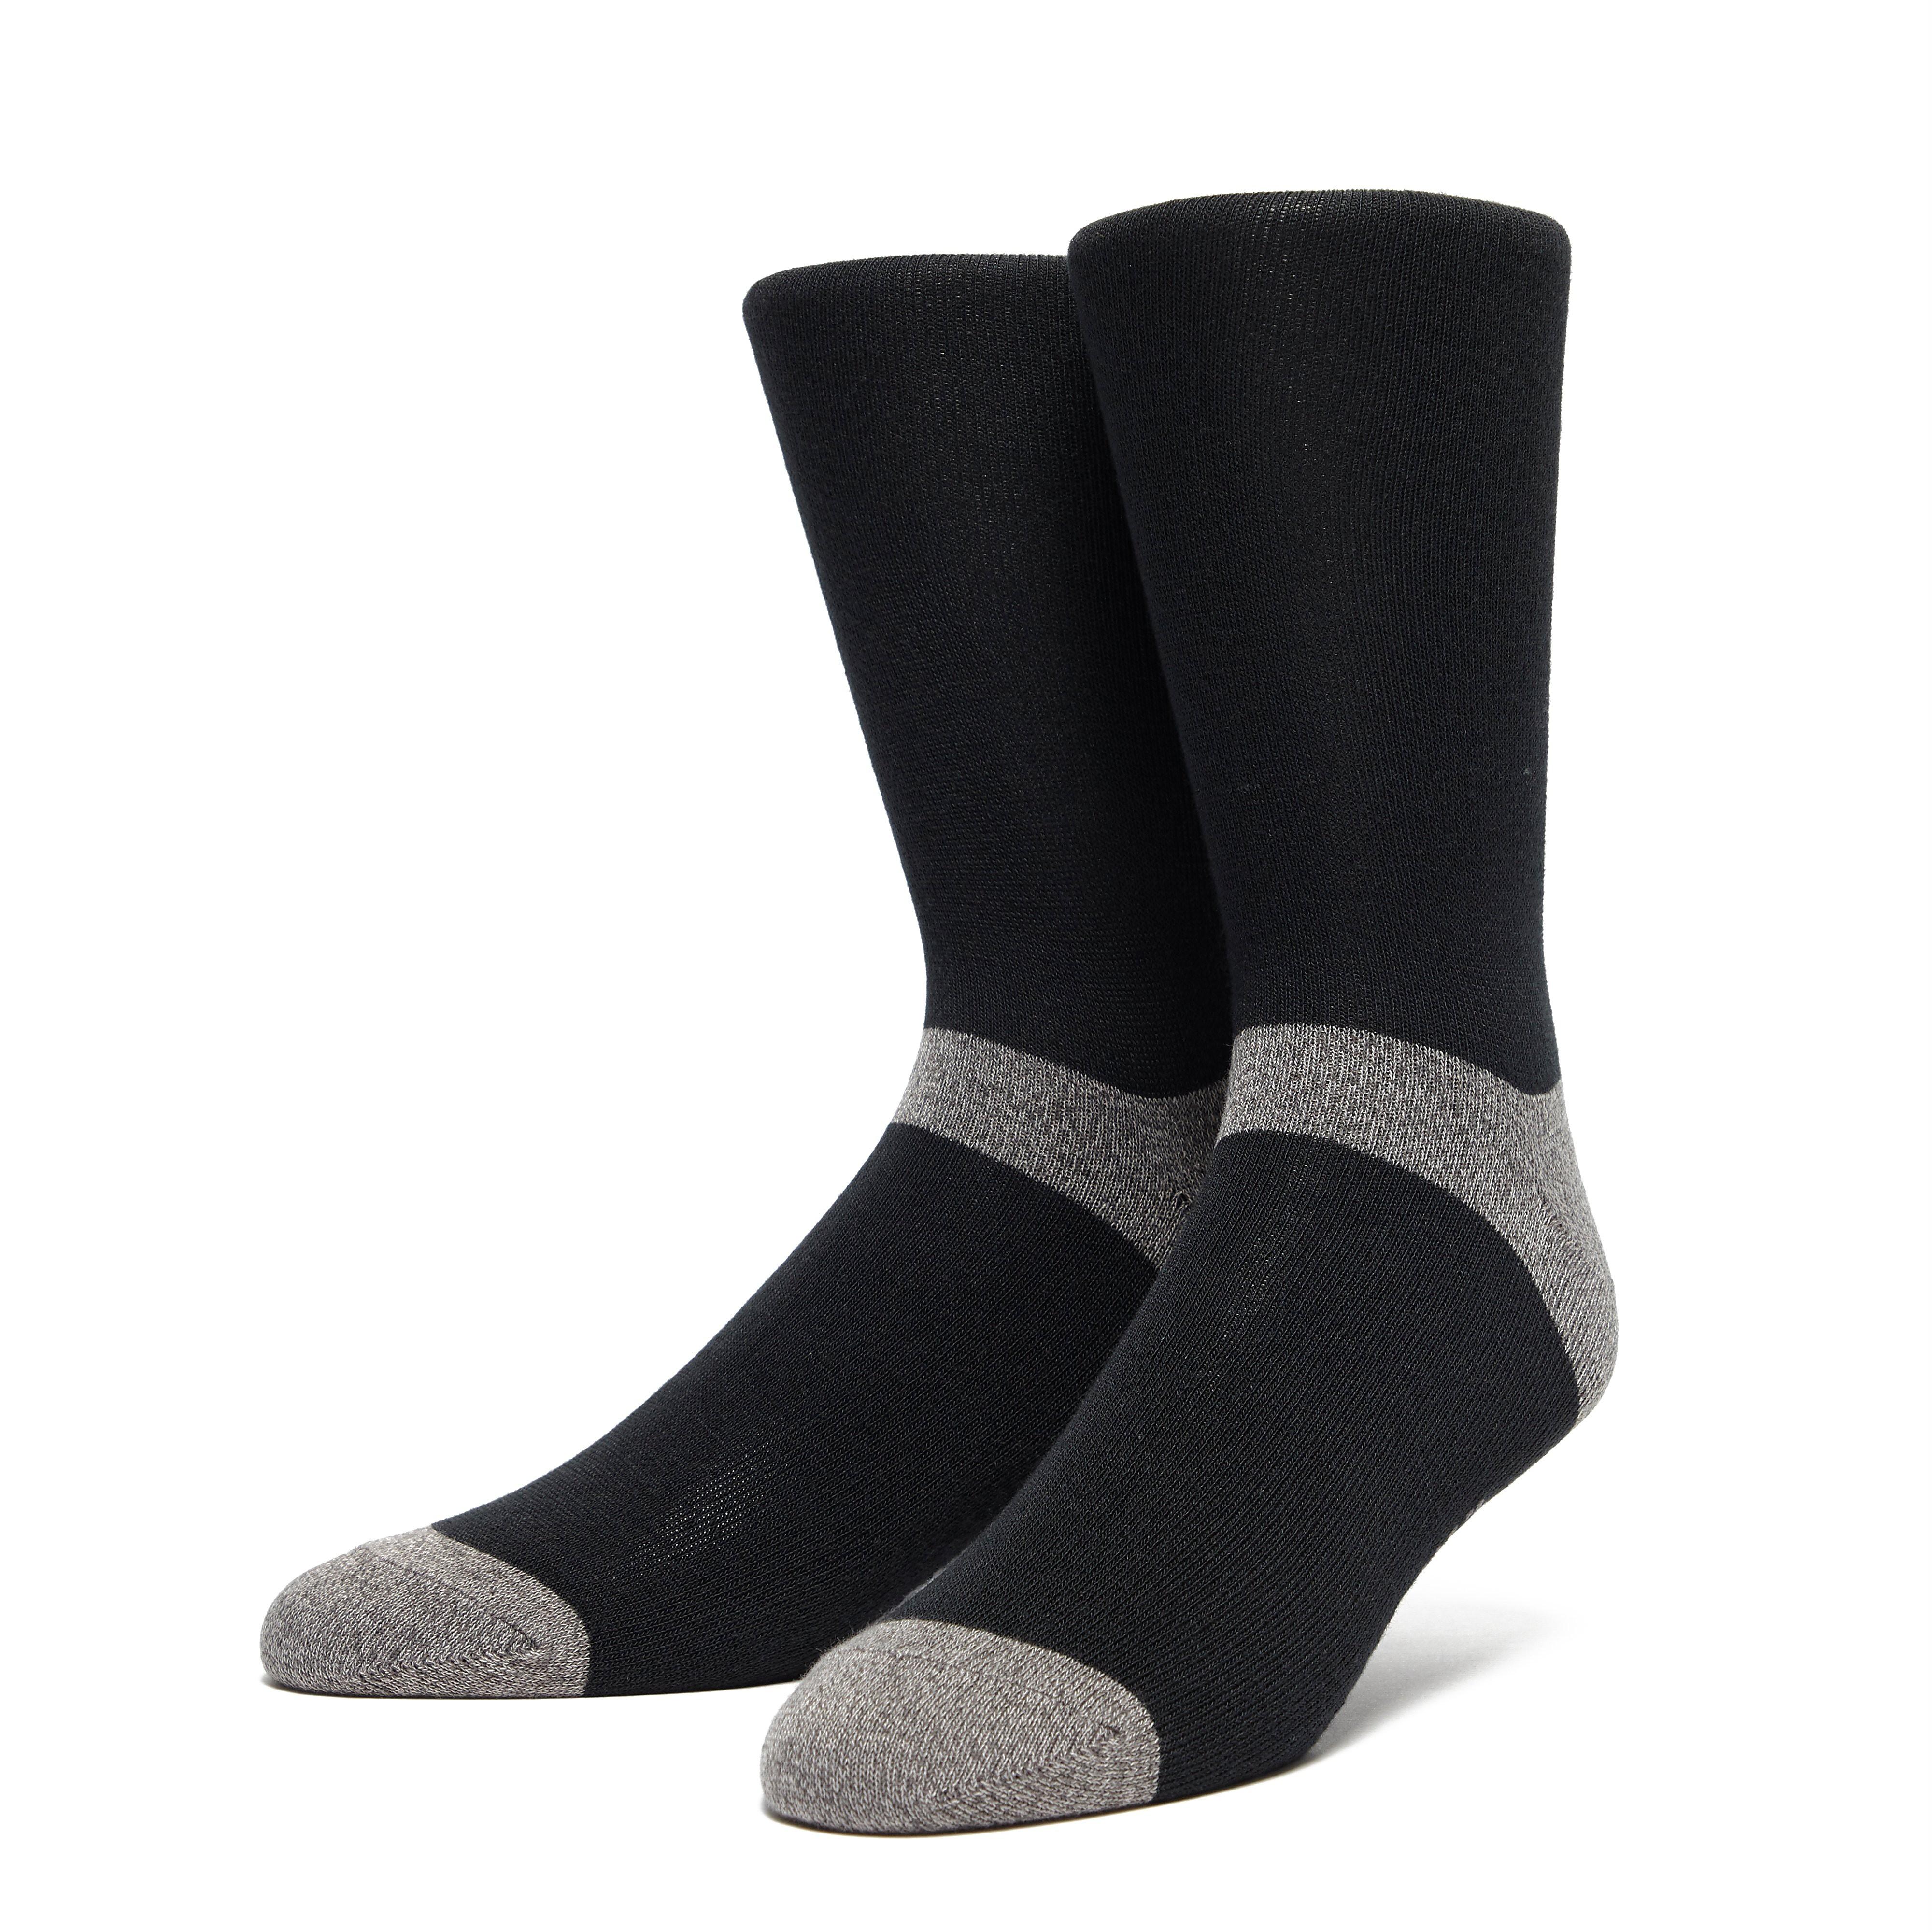 Peter Storm 1 Pair Unisex Multiactive Coolmax Liner Socks